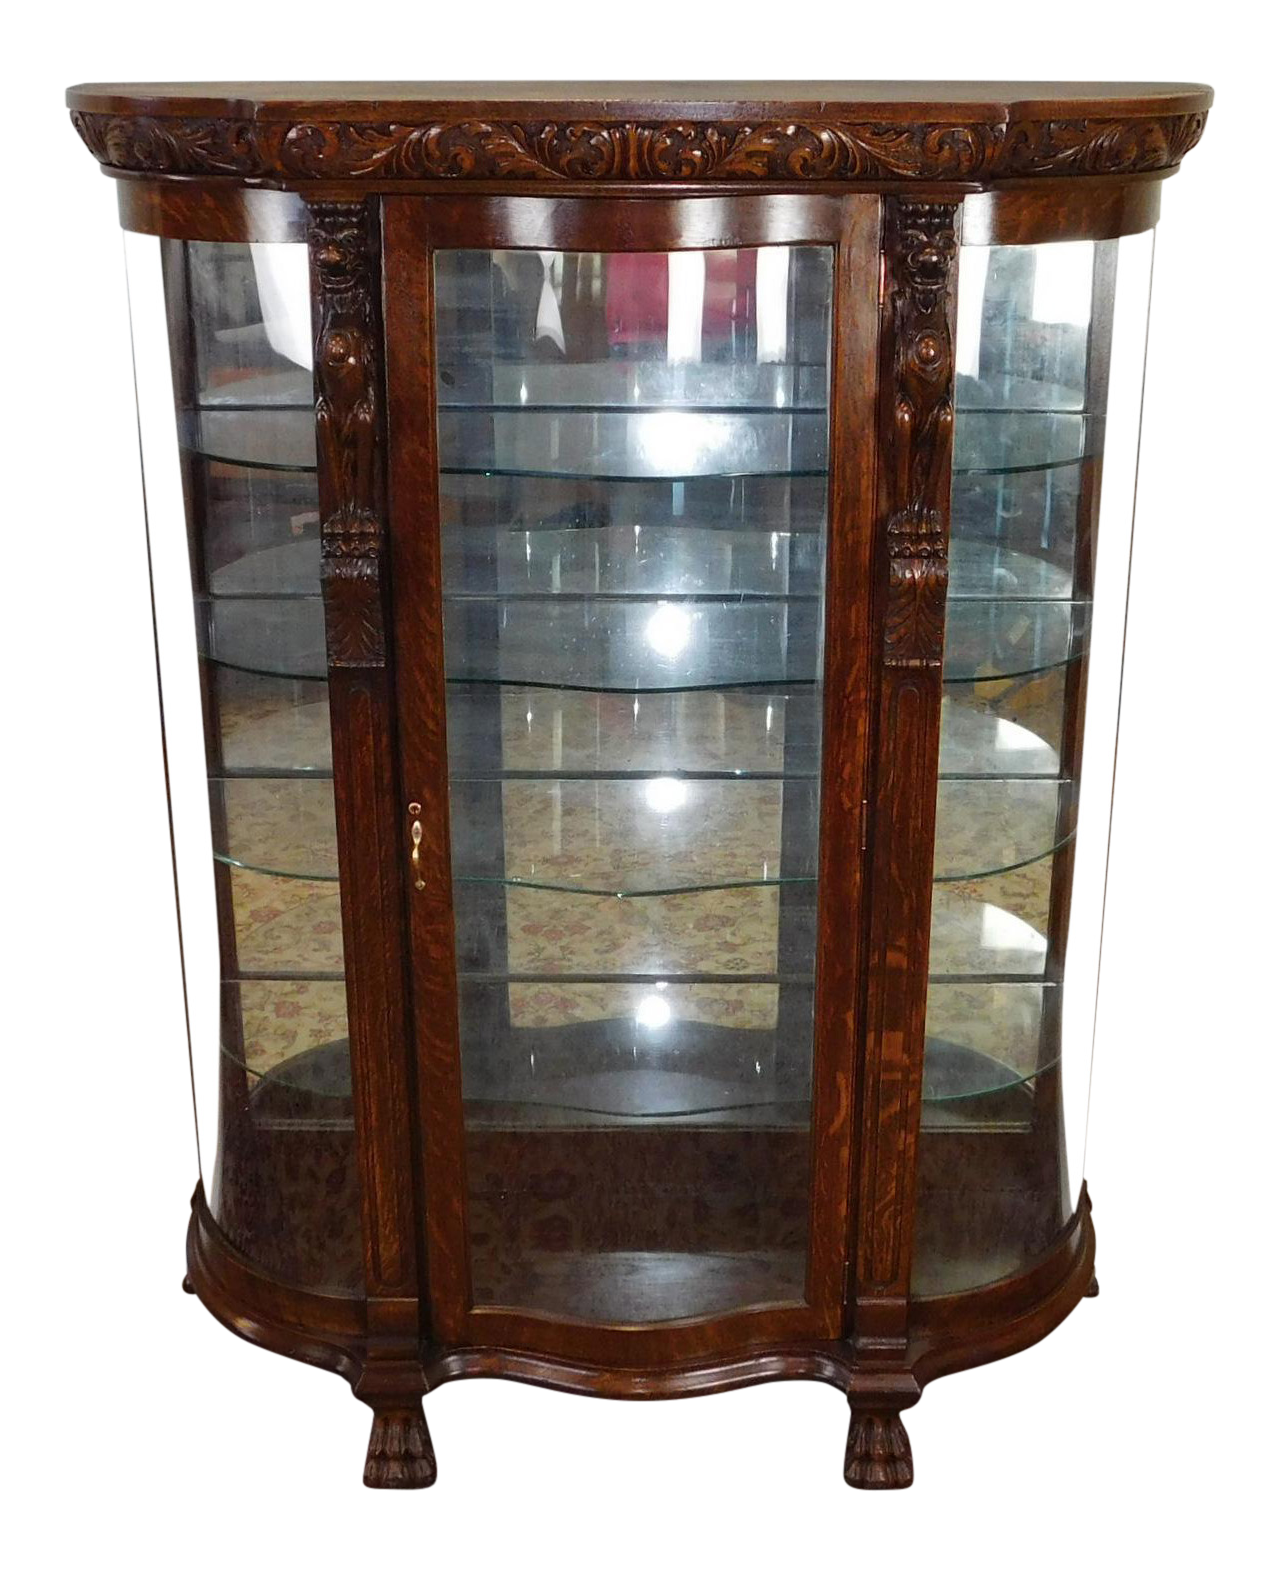 Charmant Antique Victorian Carved Figural Quartered Oak Curved Glass Curio Cabinet  C1900